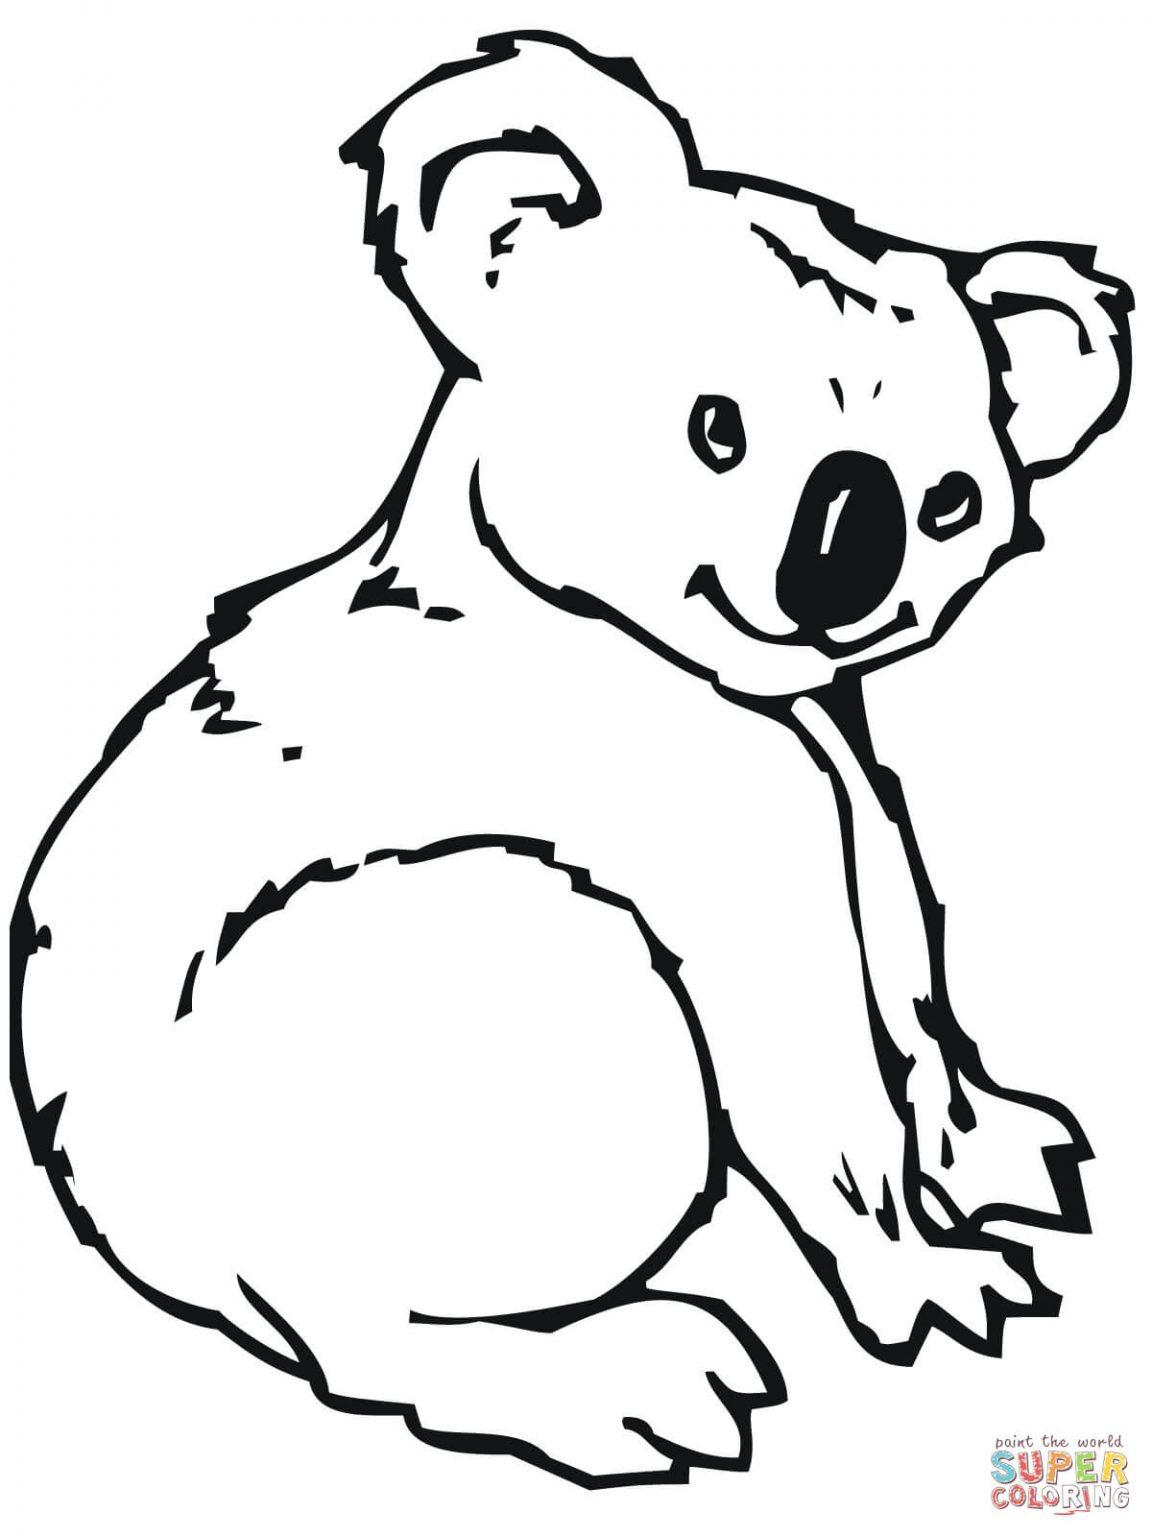 Malvorlage Koala - kinderbilderdownload kinderbilder